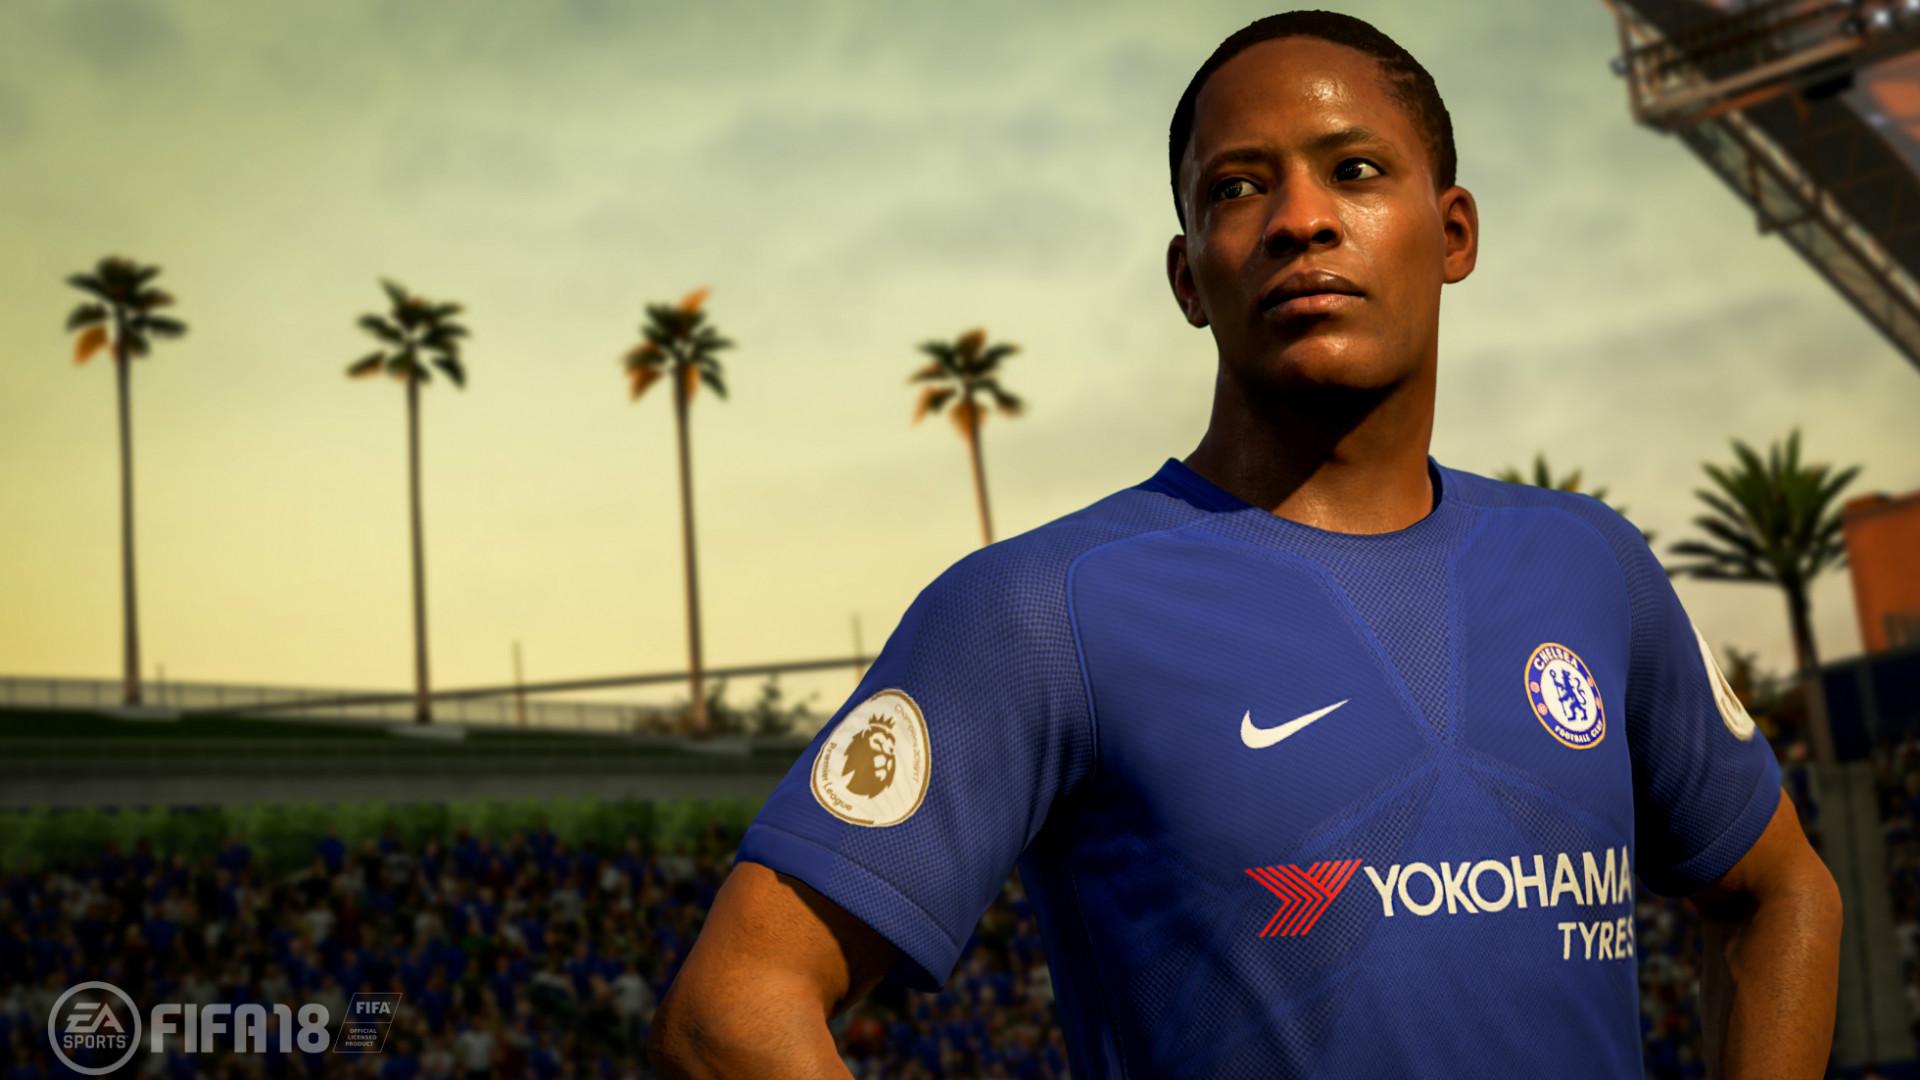 FIFA 18 Chelsea kit reveal (screenshot)